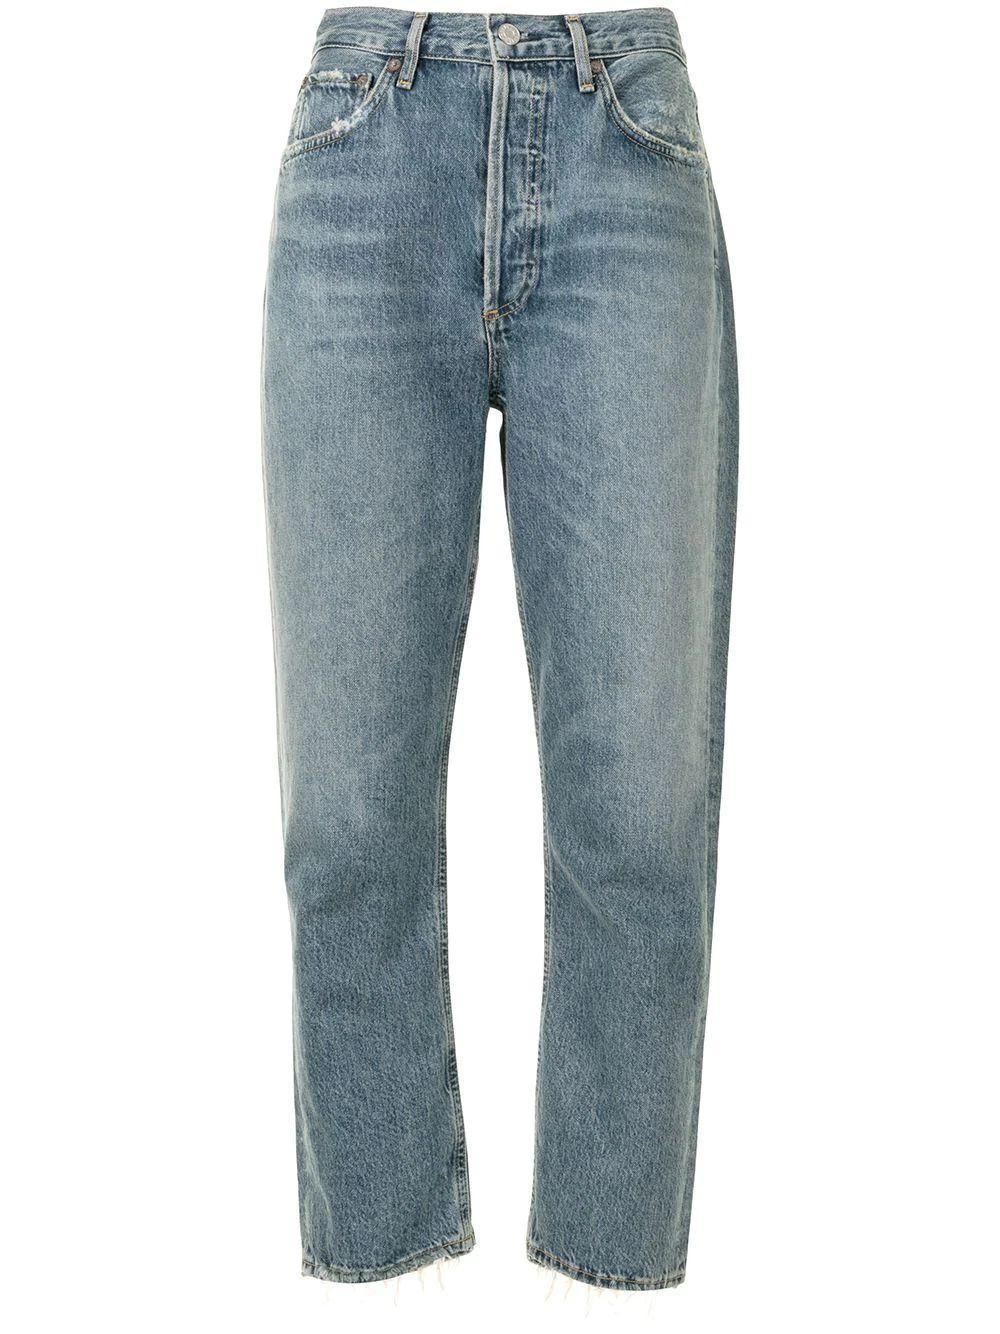 Riley Straight Leg Cropped Jean Item # A056C-983